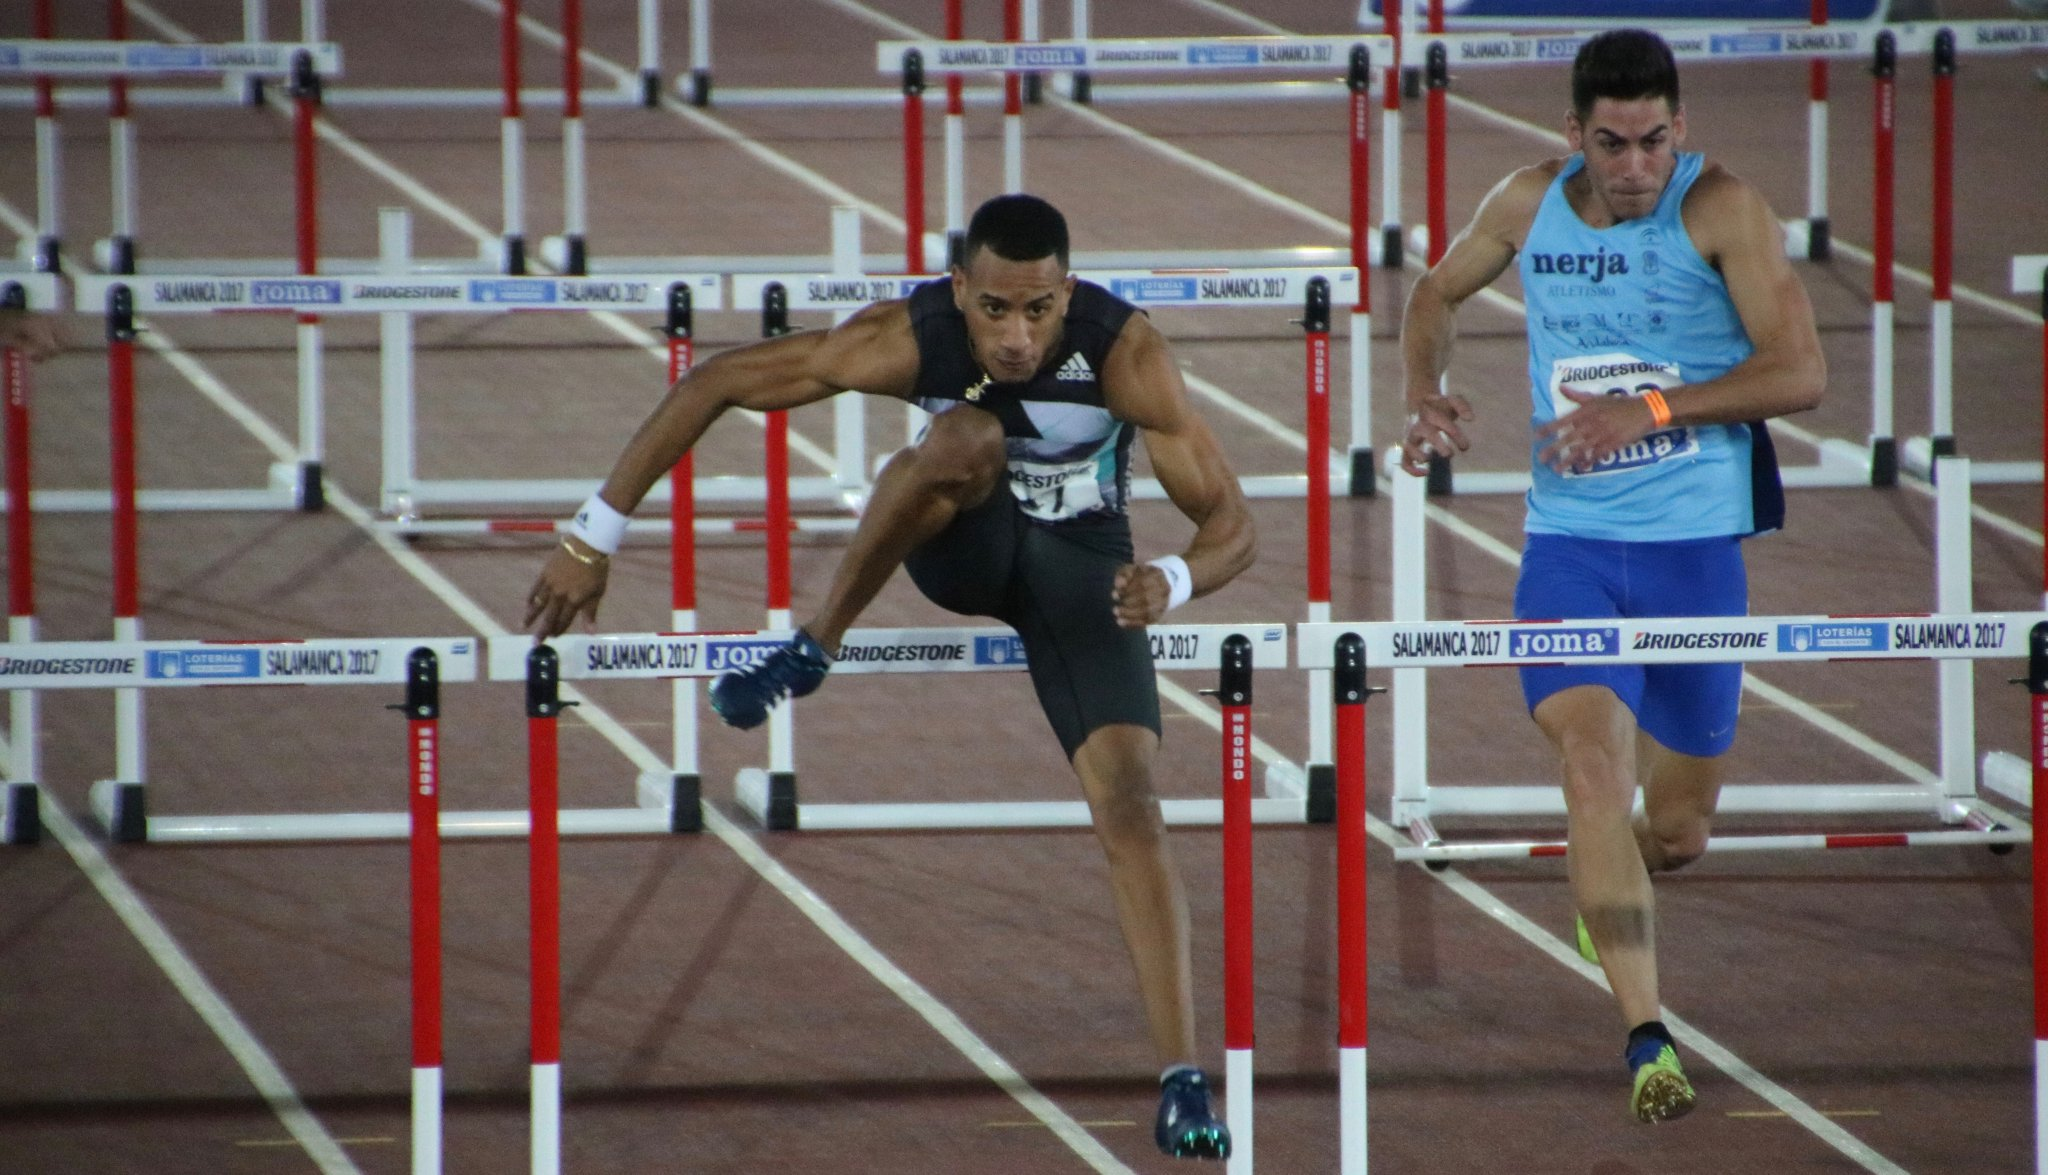 Espectacular jornada de atletismo